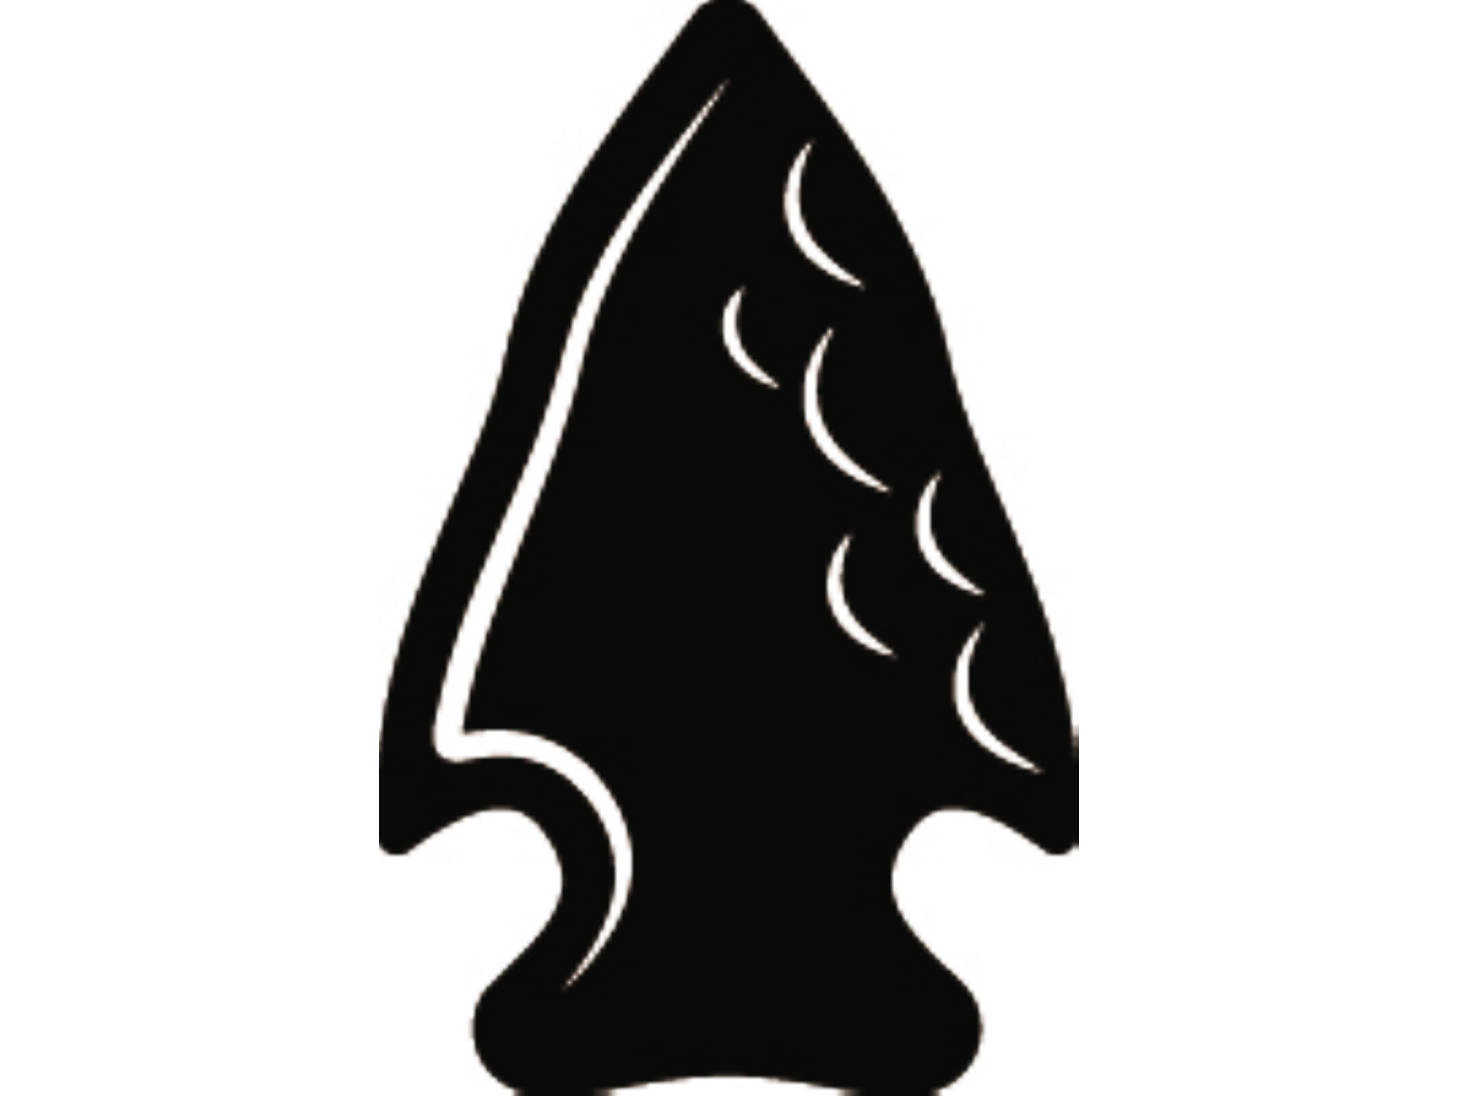 Arrowhead clipart. Indian native american warrior